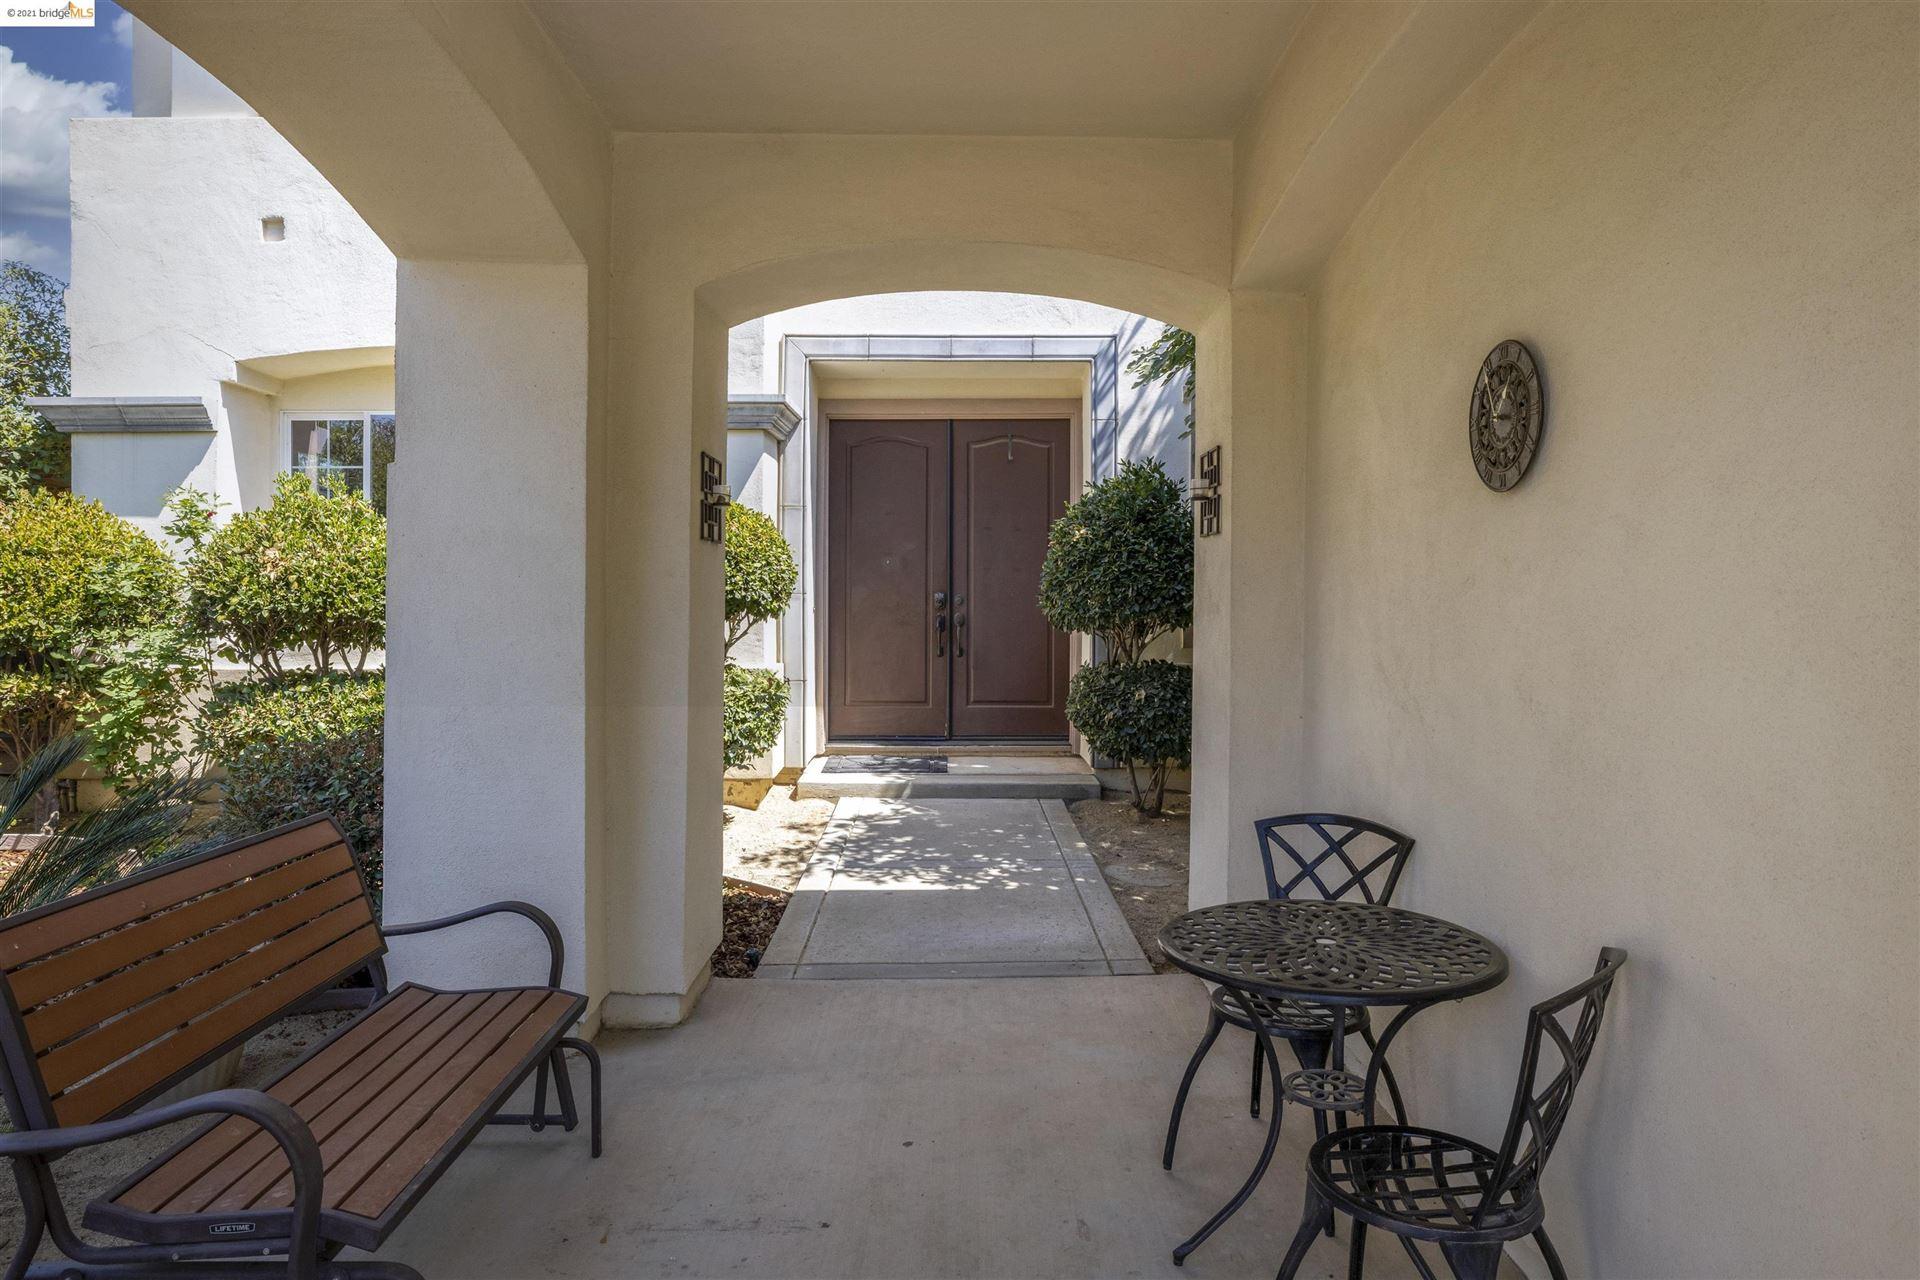 Photo of 2304 Demartini Ln, BRENTWOOD, CA 94513 (MLS # 40965137)